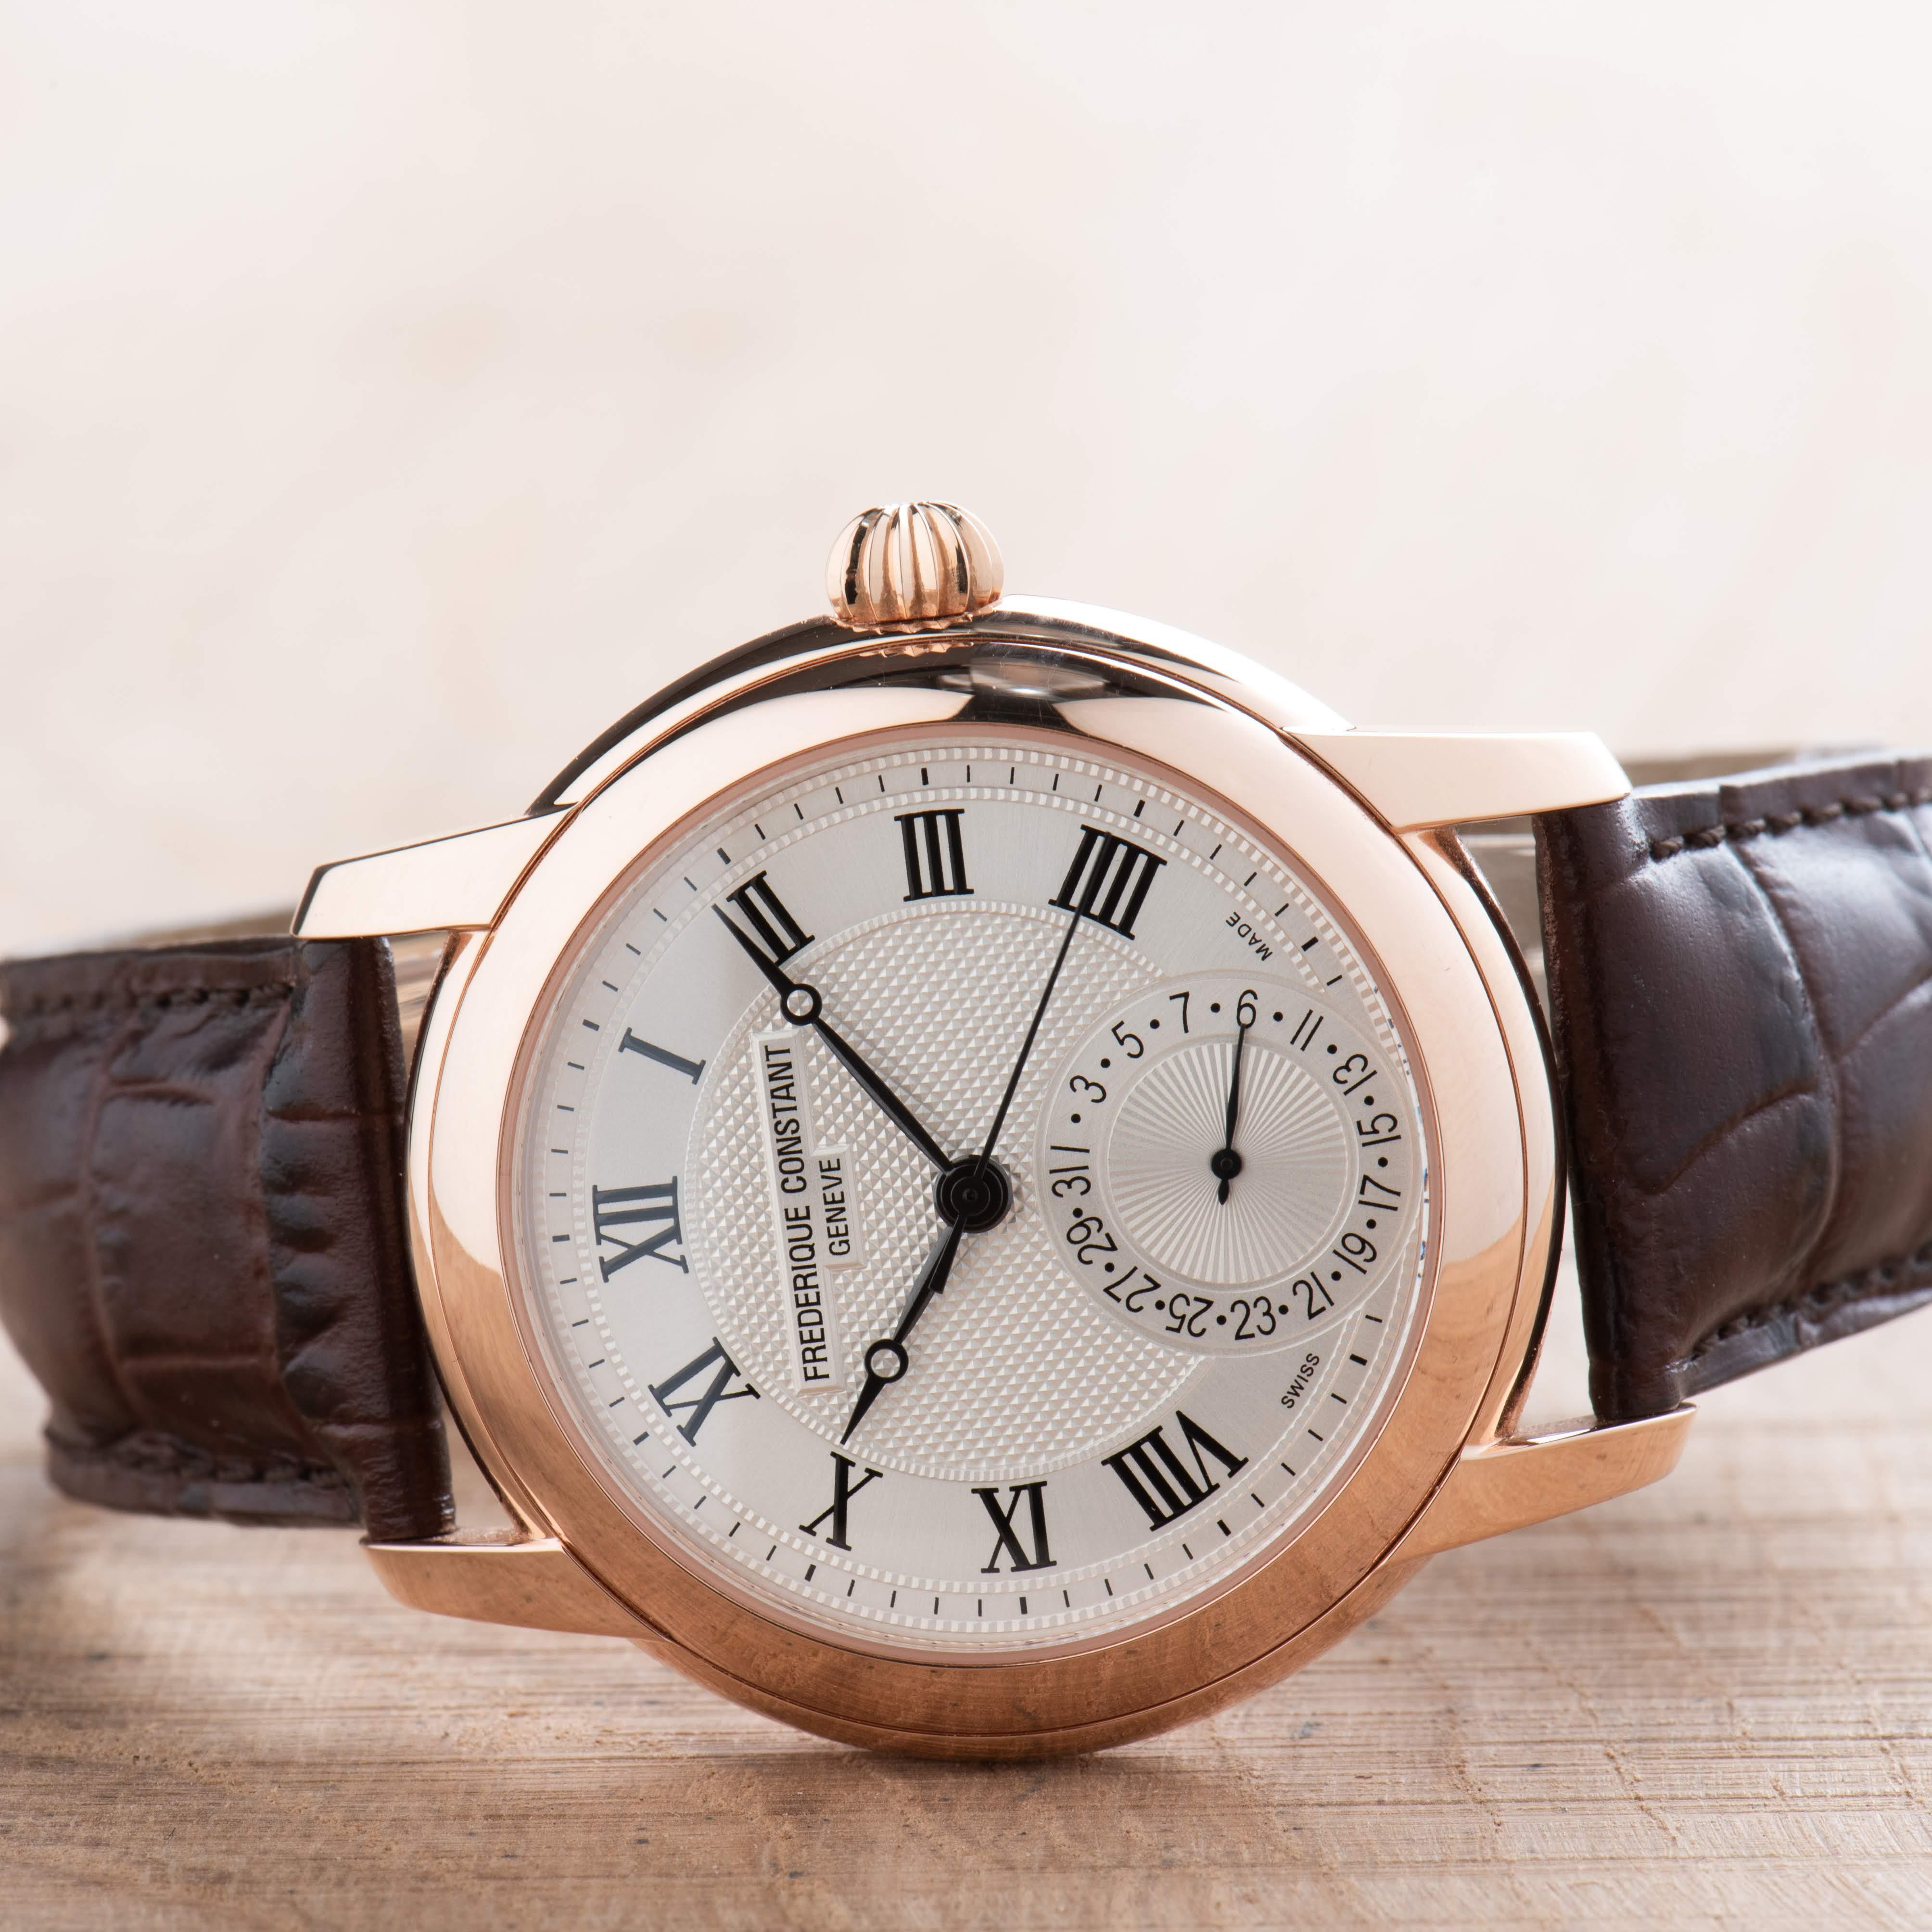 Frederique Constant Manufacture Date Rose Gold Men's Watch ref. FC710MC4H4